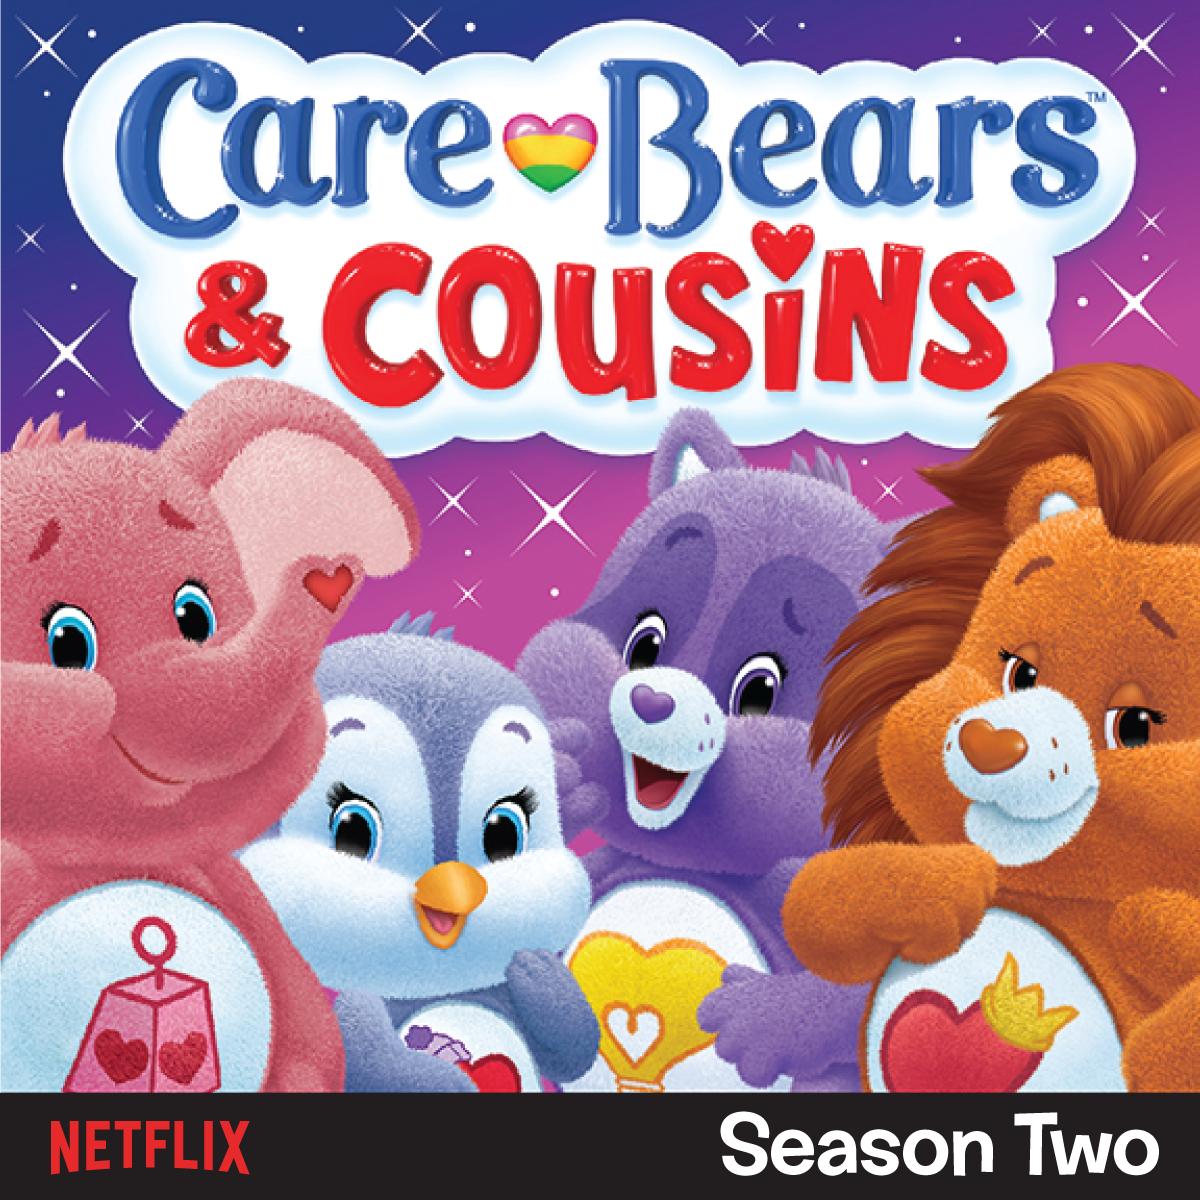 Care Bears Cousins Season 2 Coming To Netflix February 5